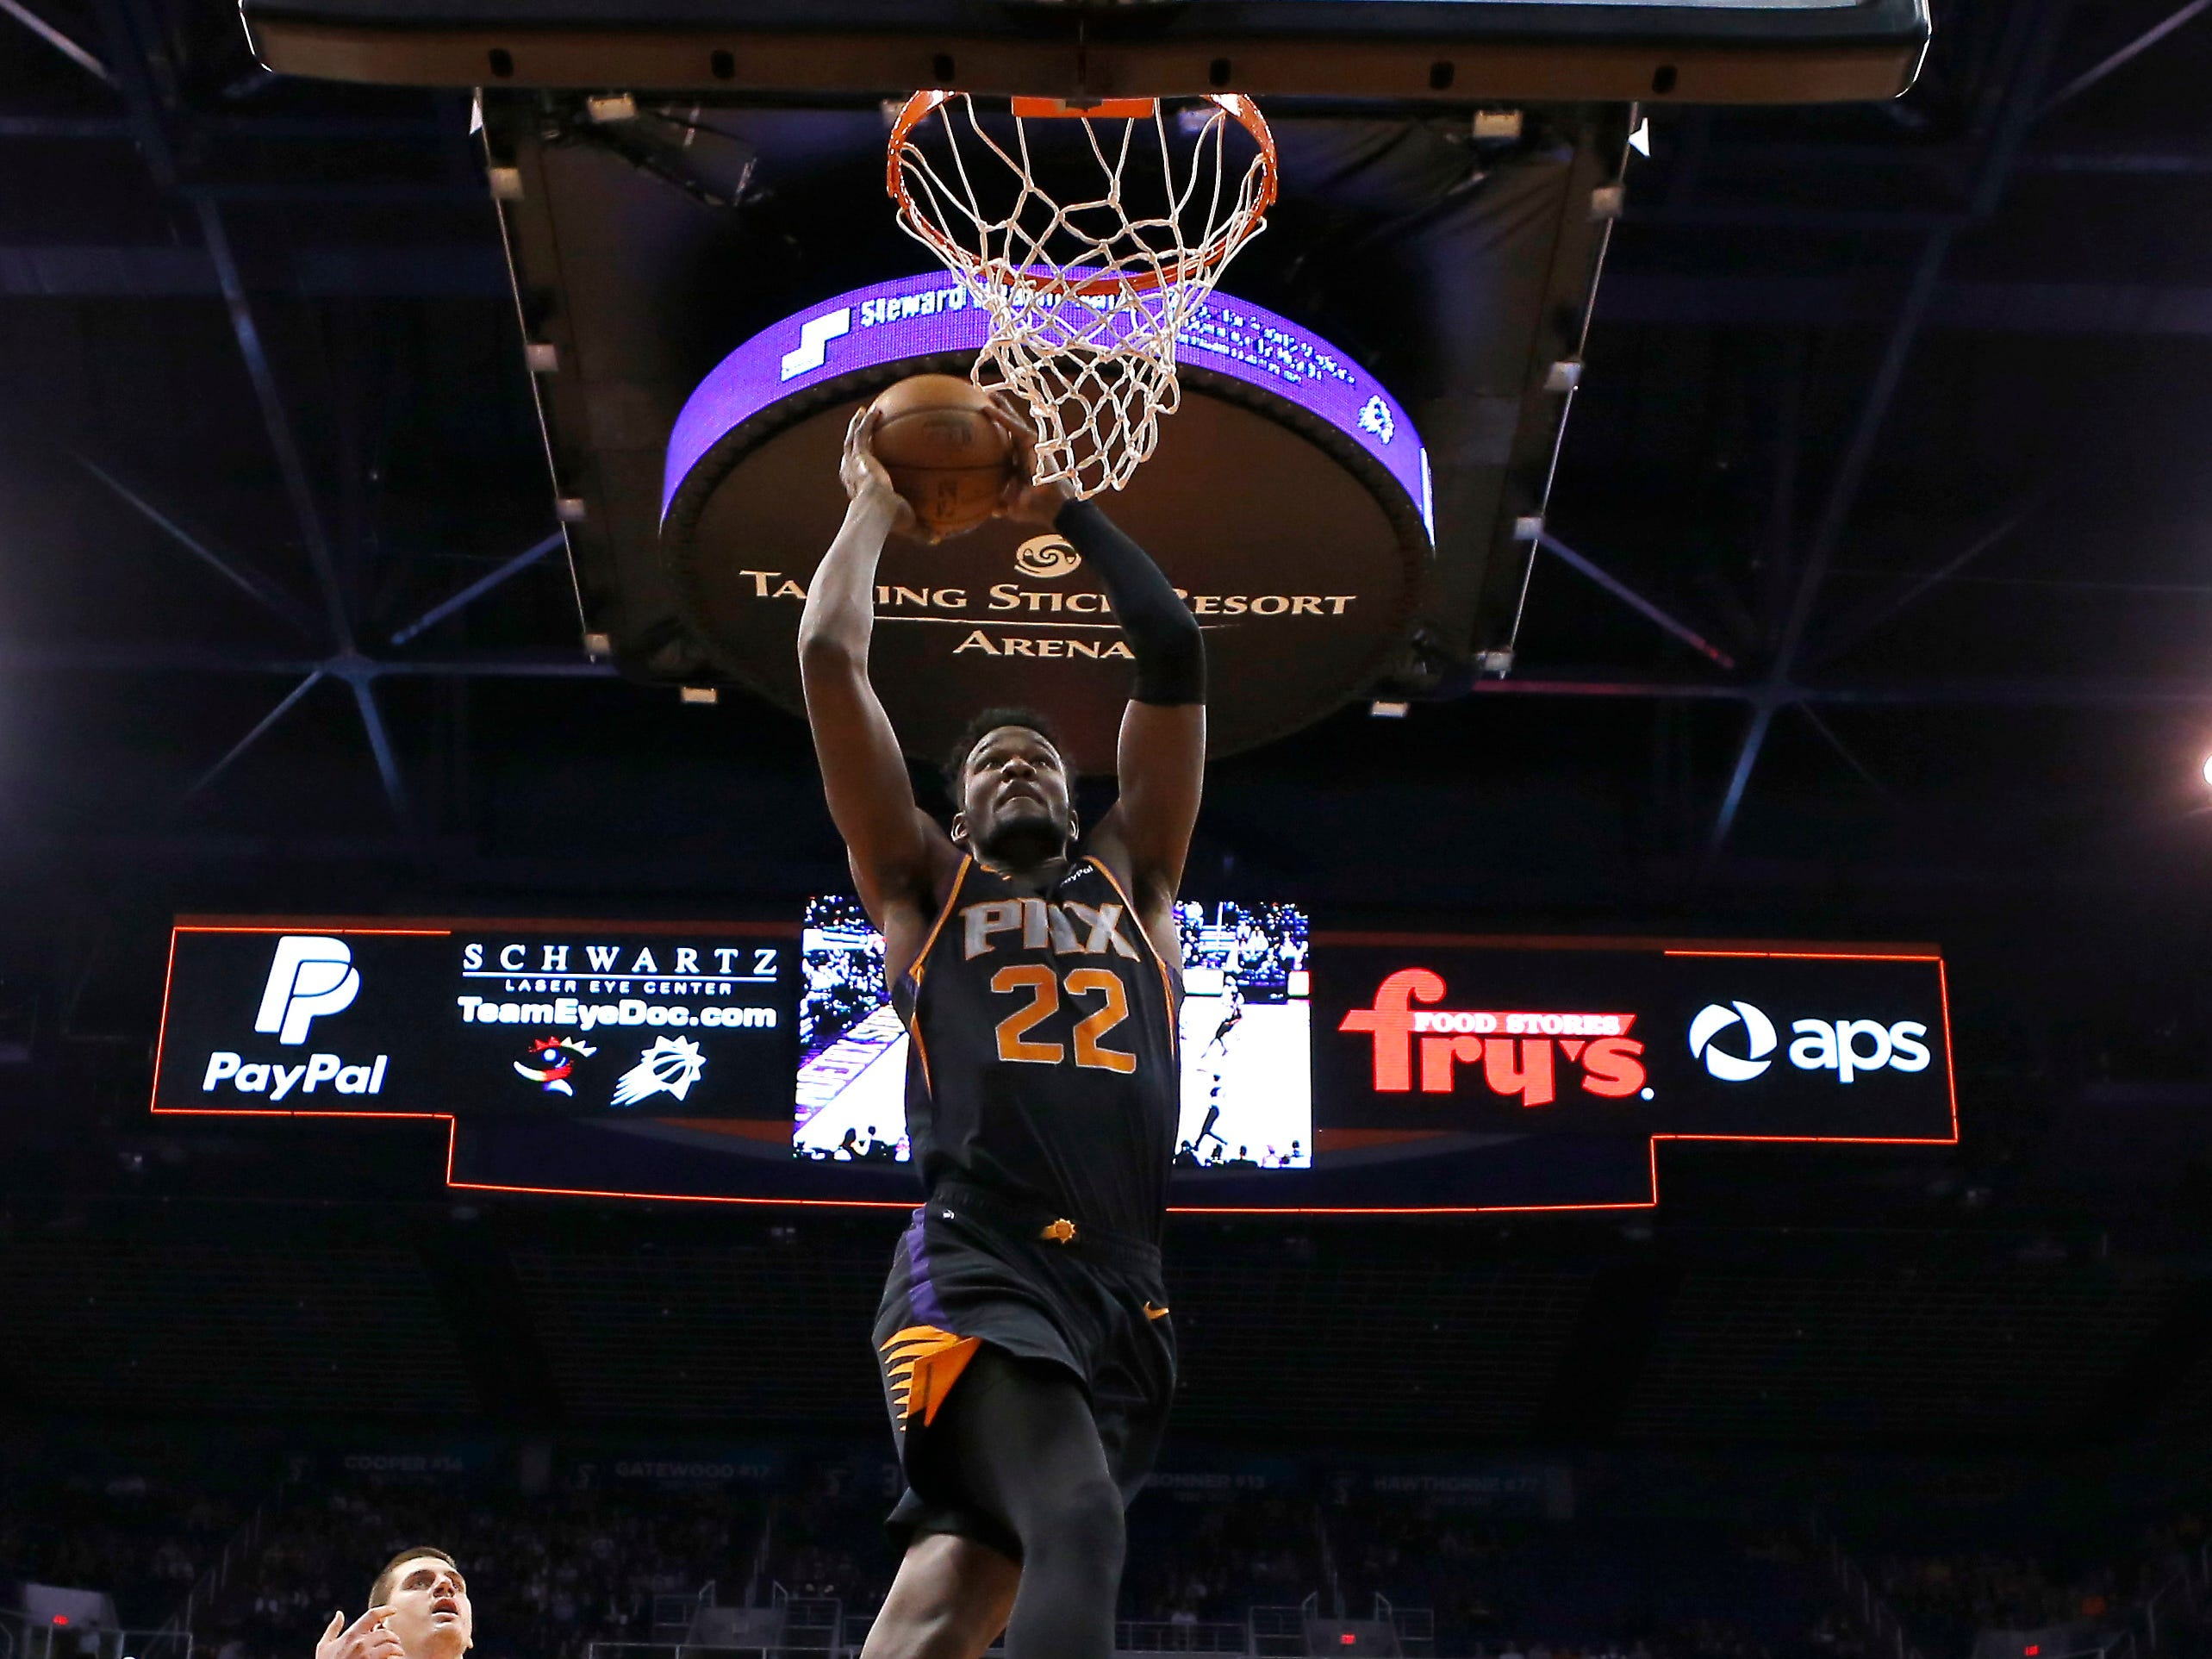 Phoenix Suns center Deandre Ayton (22) dunks against the Denver Nuggets in the second half, Saturday, Jan. 12, 2019, in Phoenix.  (AP Photo/Rick Scuteri)